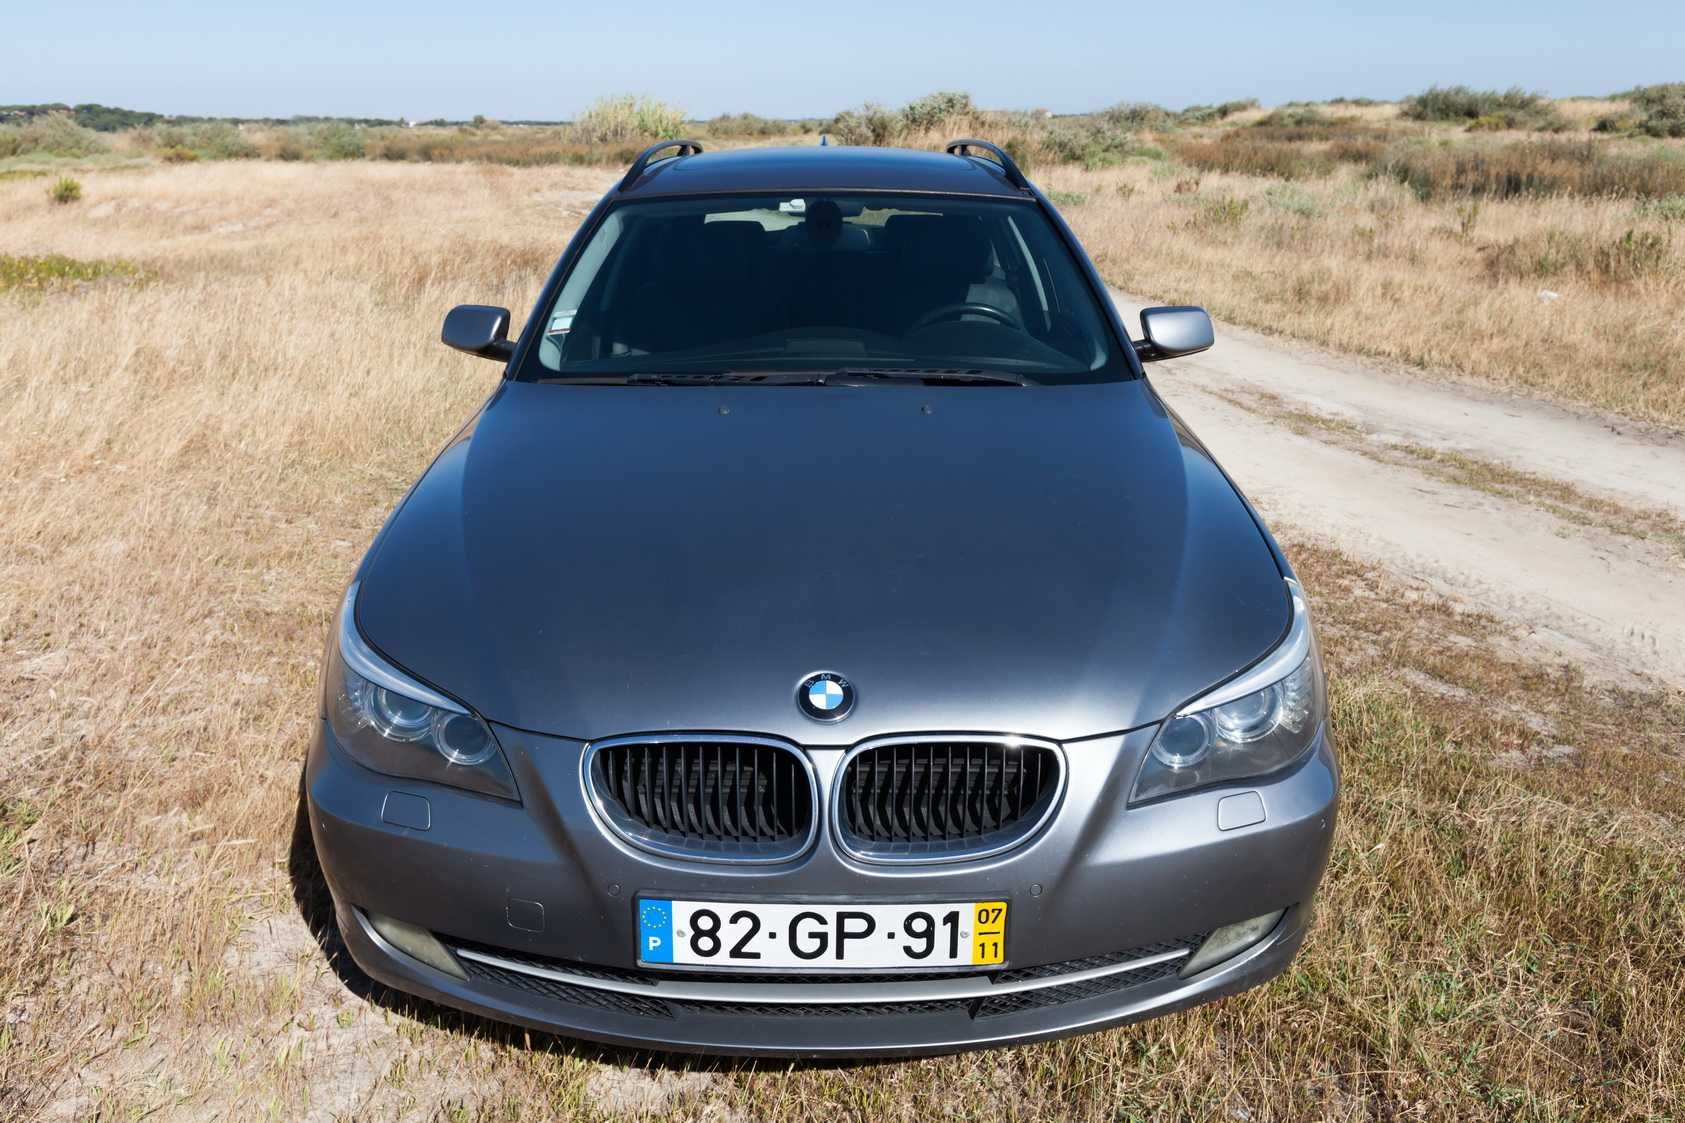 BMW 520d Prateado com Teto Panorâmico